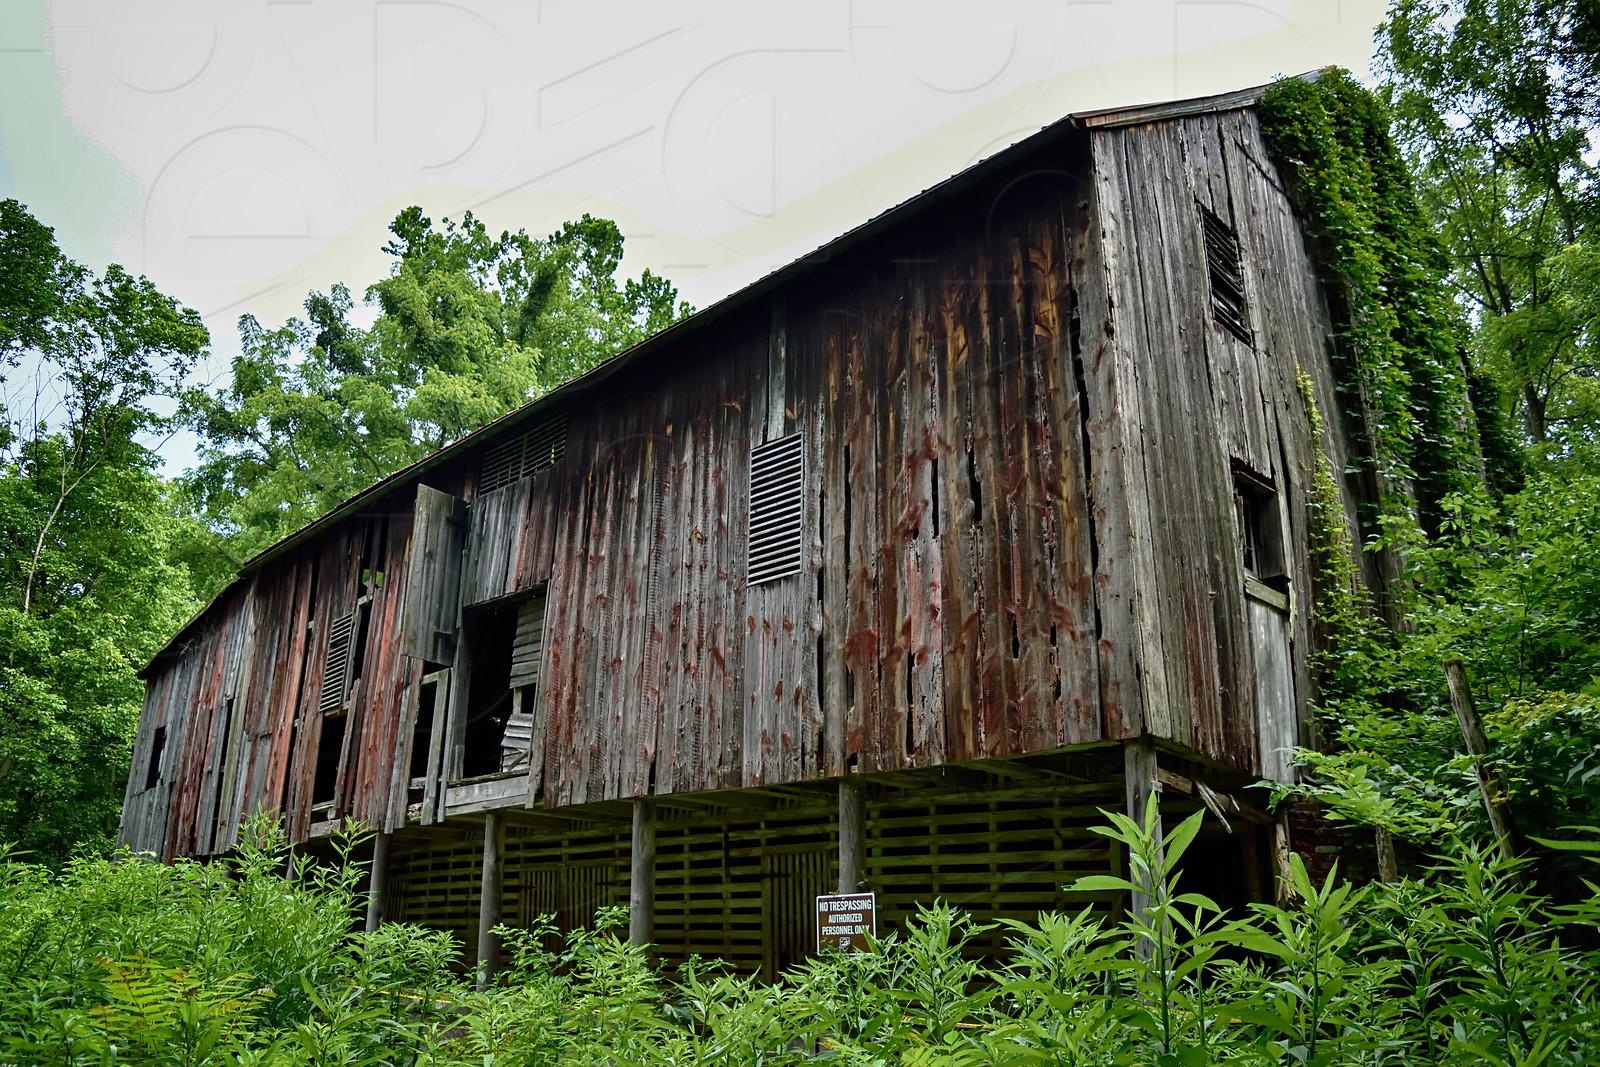 Barn a Long Time